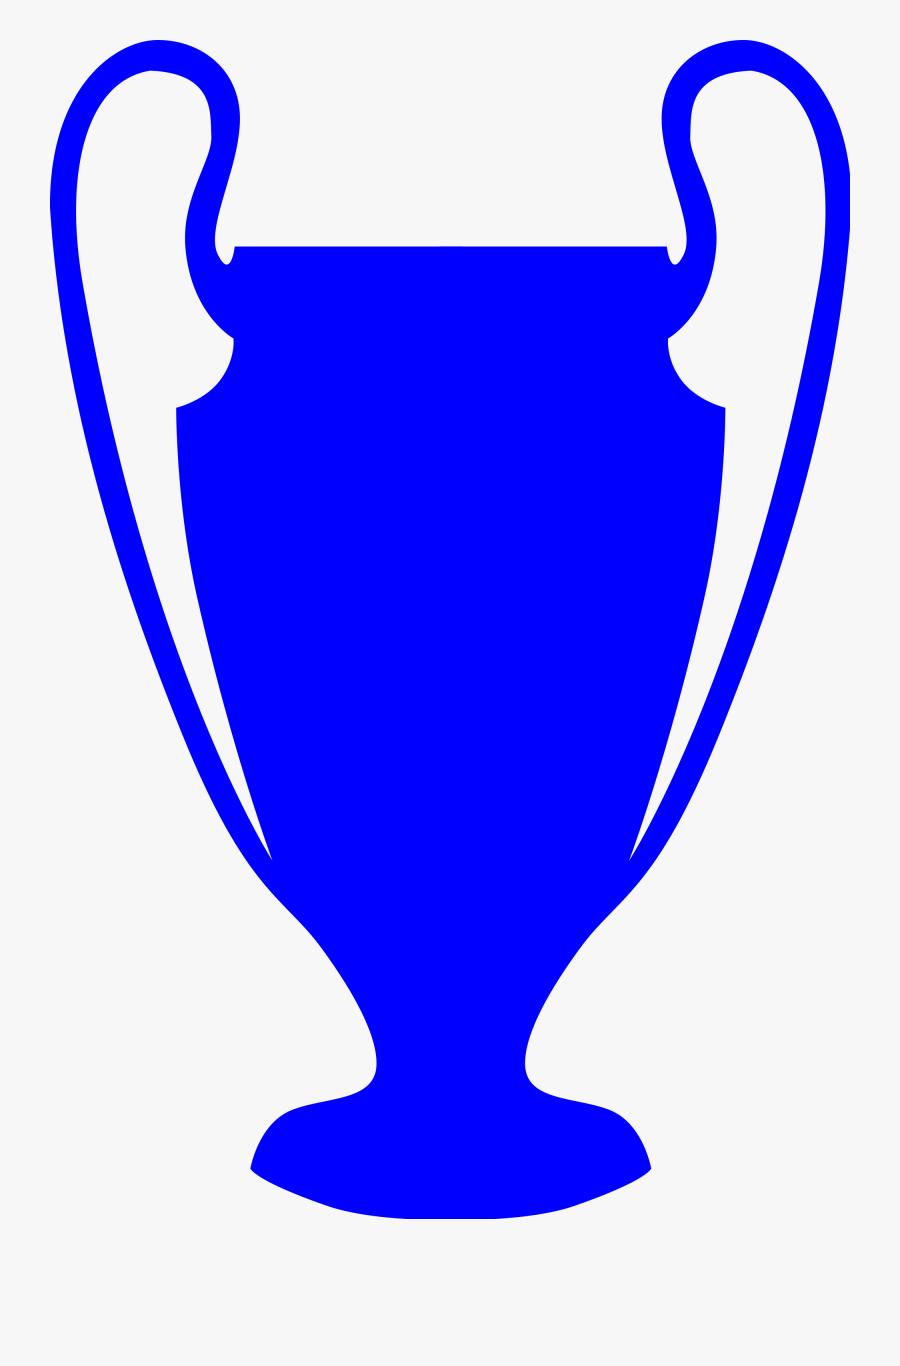 Clip Art Freeuse File Championsleague Svg Wikimedia - Logo Champions League Cup, Transparent Clipart